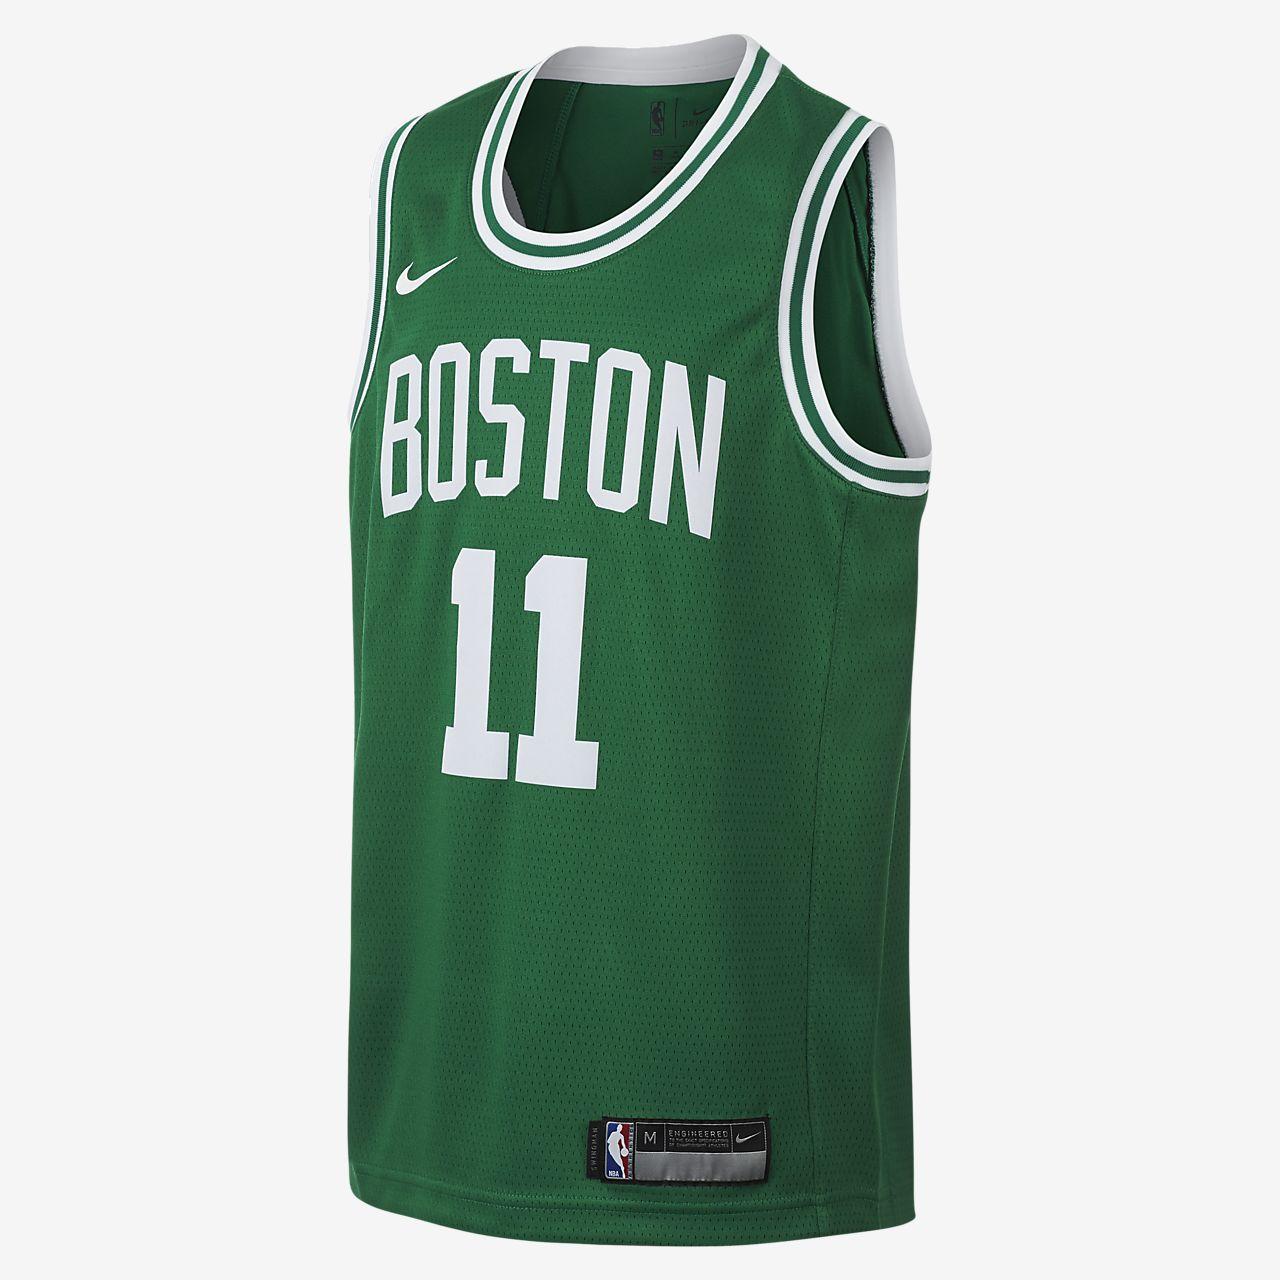 Kyrie Irving Boston Celtics Nike Icon Edition Swingman Jersey NBA-s mez nagyobb gyerekeknek